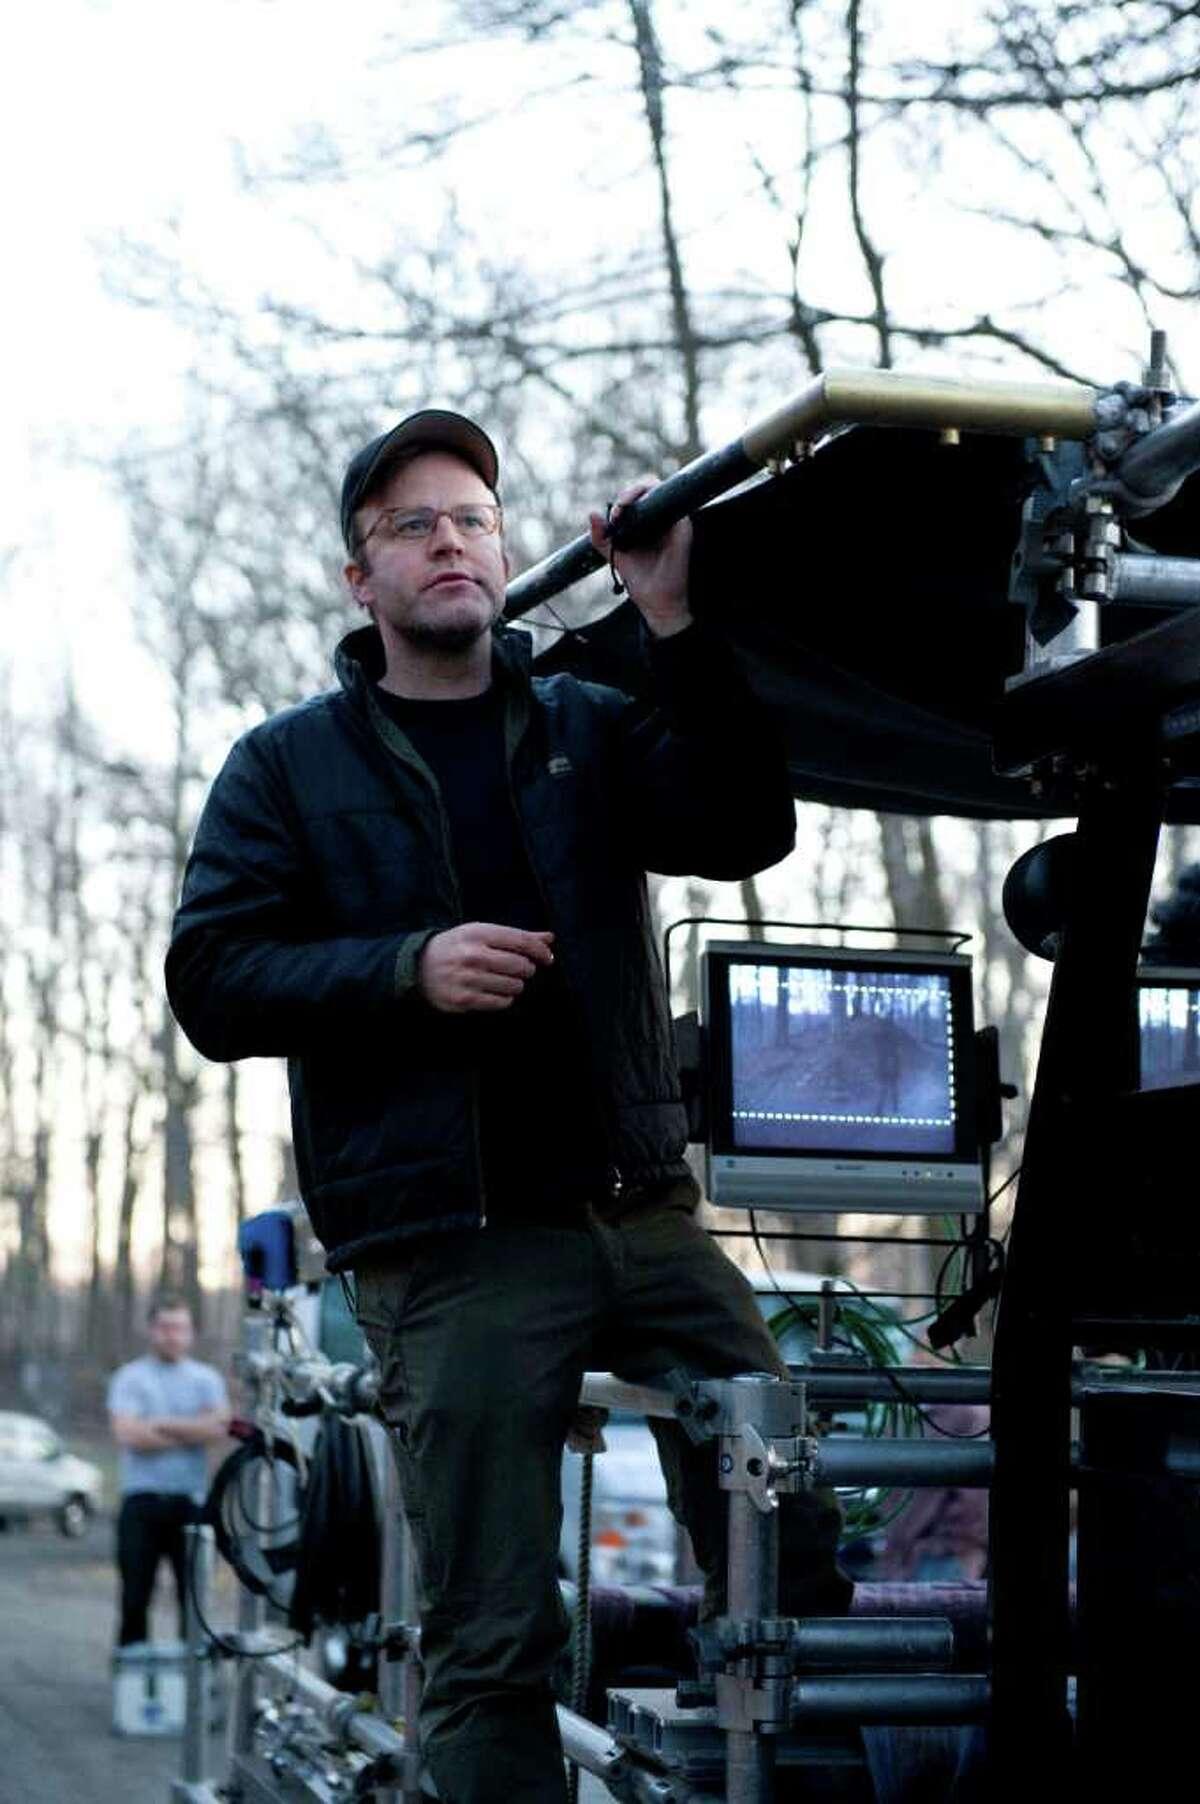 Director Tom McCarthy on the set of WIN WIN Credits: Kimberly Wright TM and © 2010 Twentieth Century Fox Film Corporation.